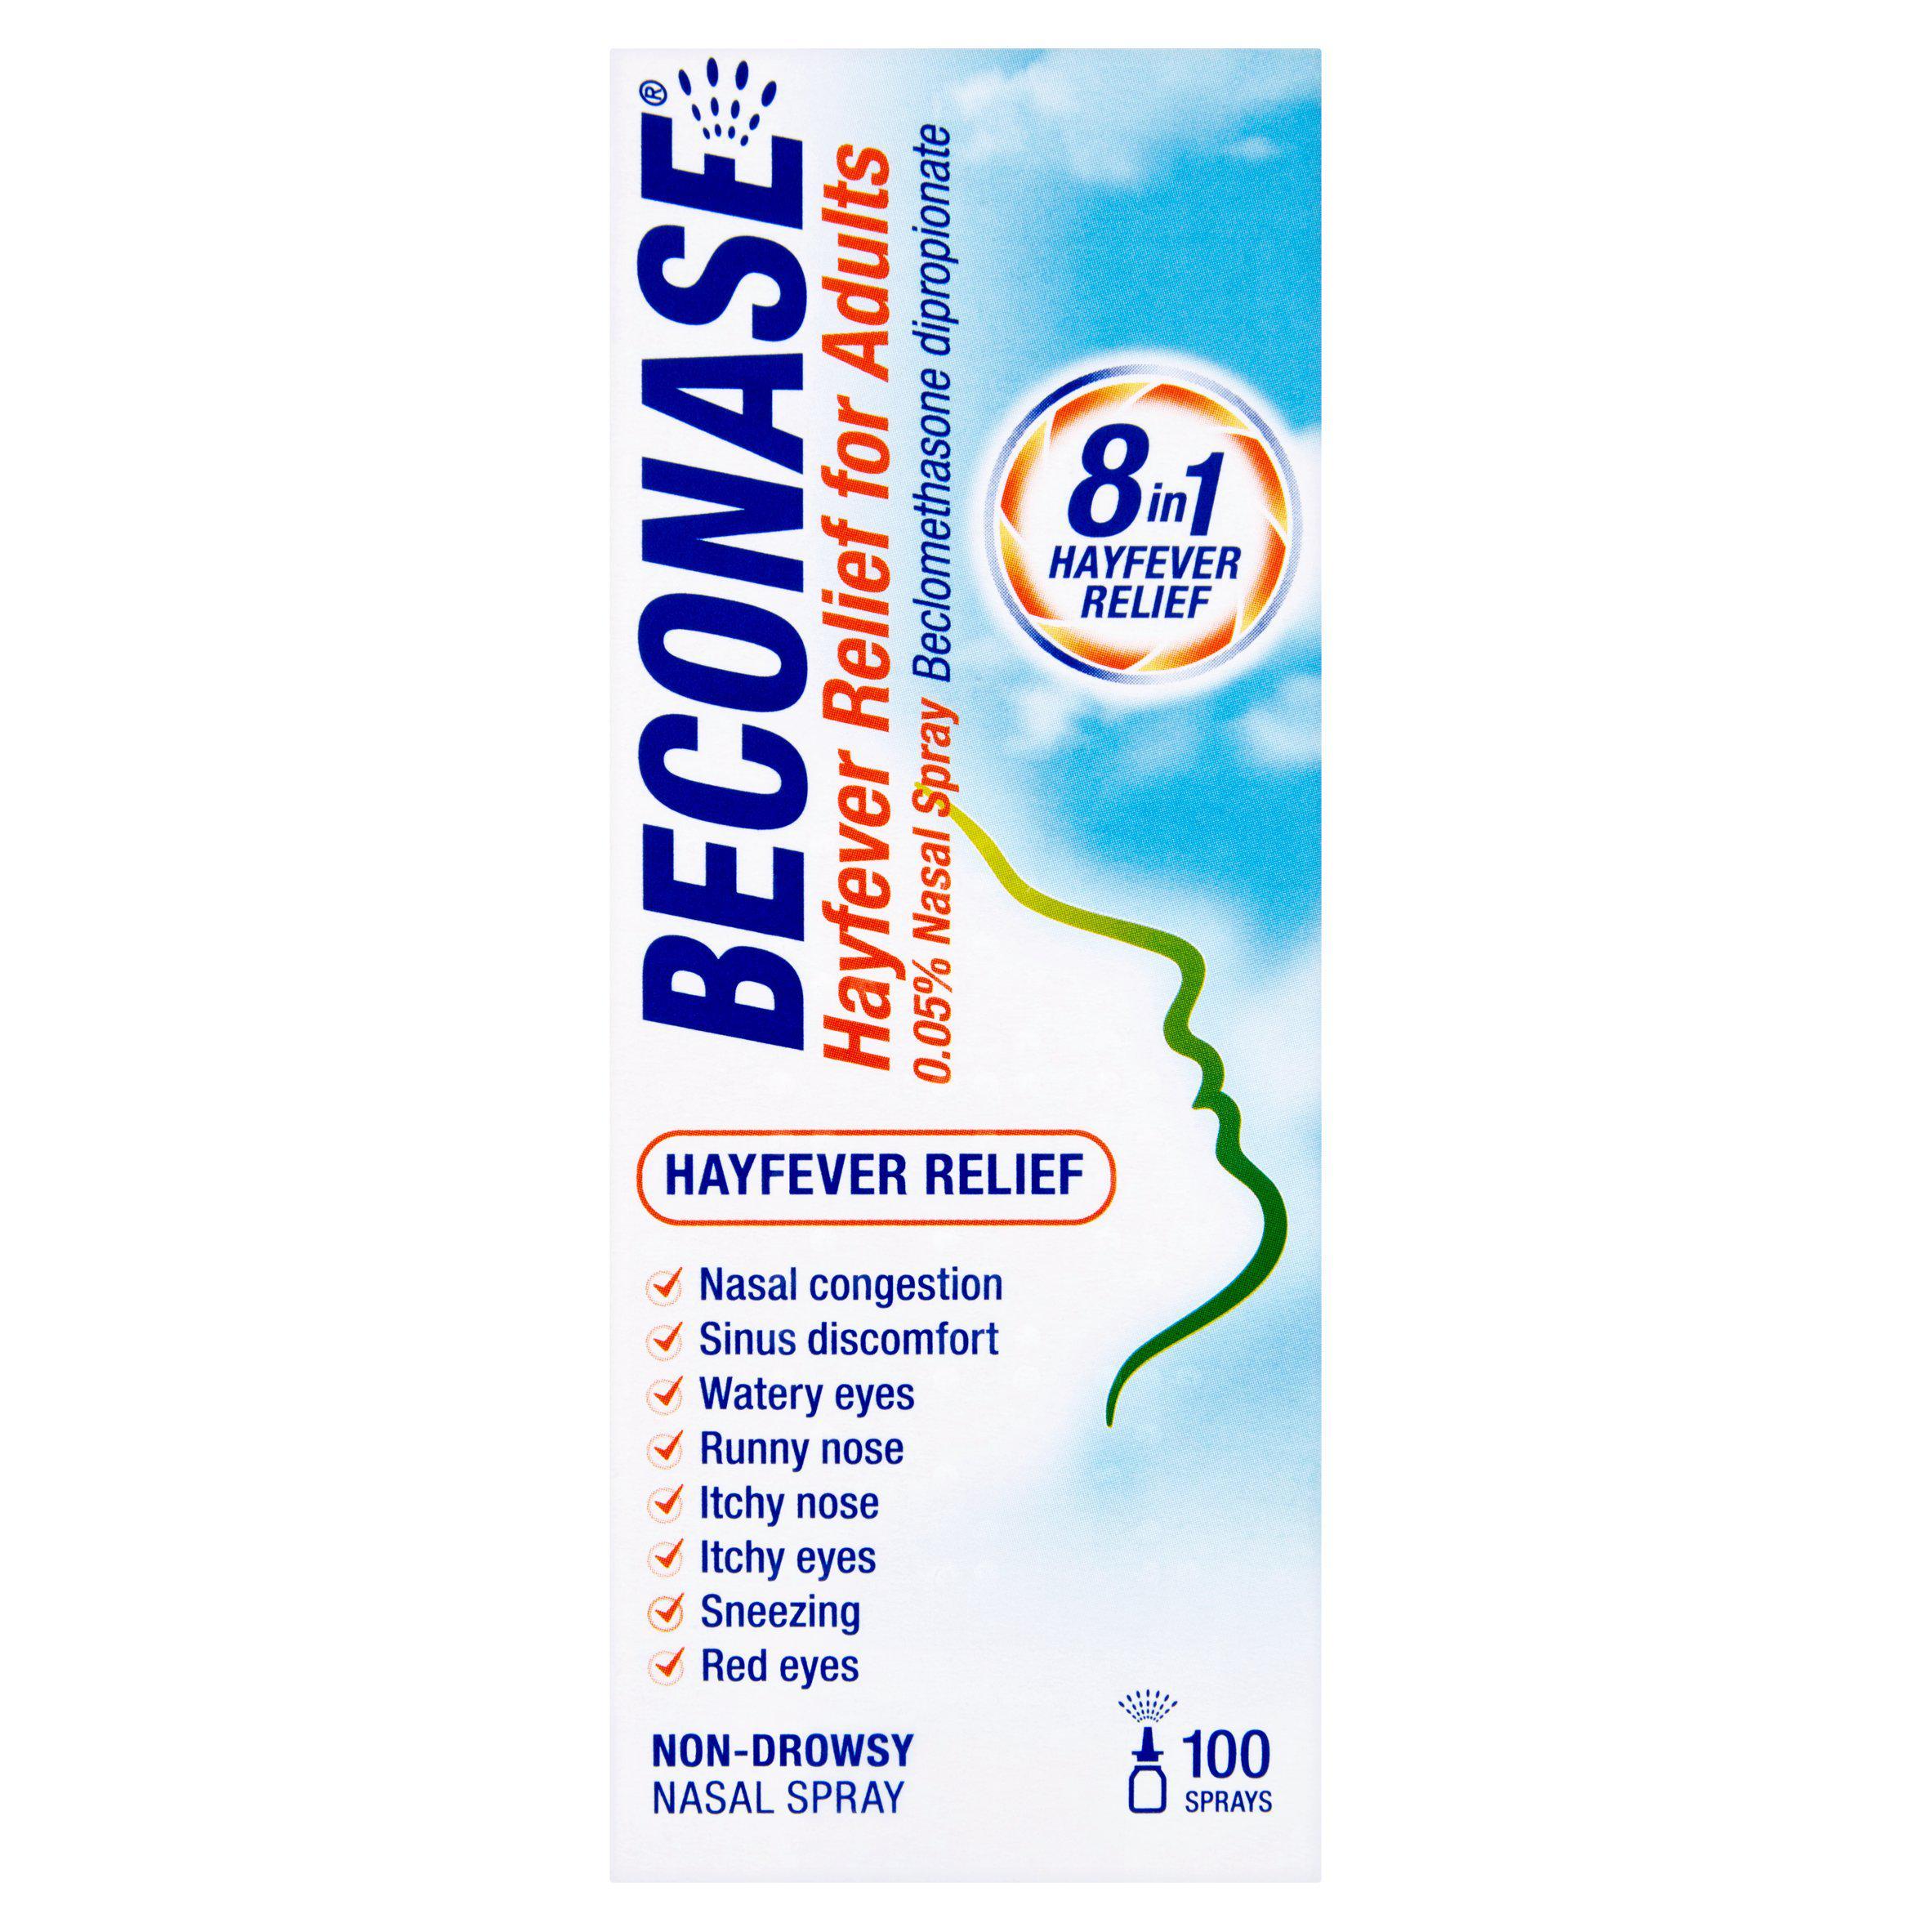 Beconase Hayfever Relief, Adult 100 sprays £4 @ Sainsbury's